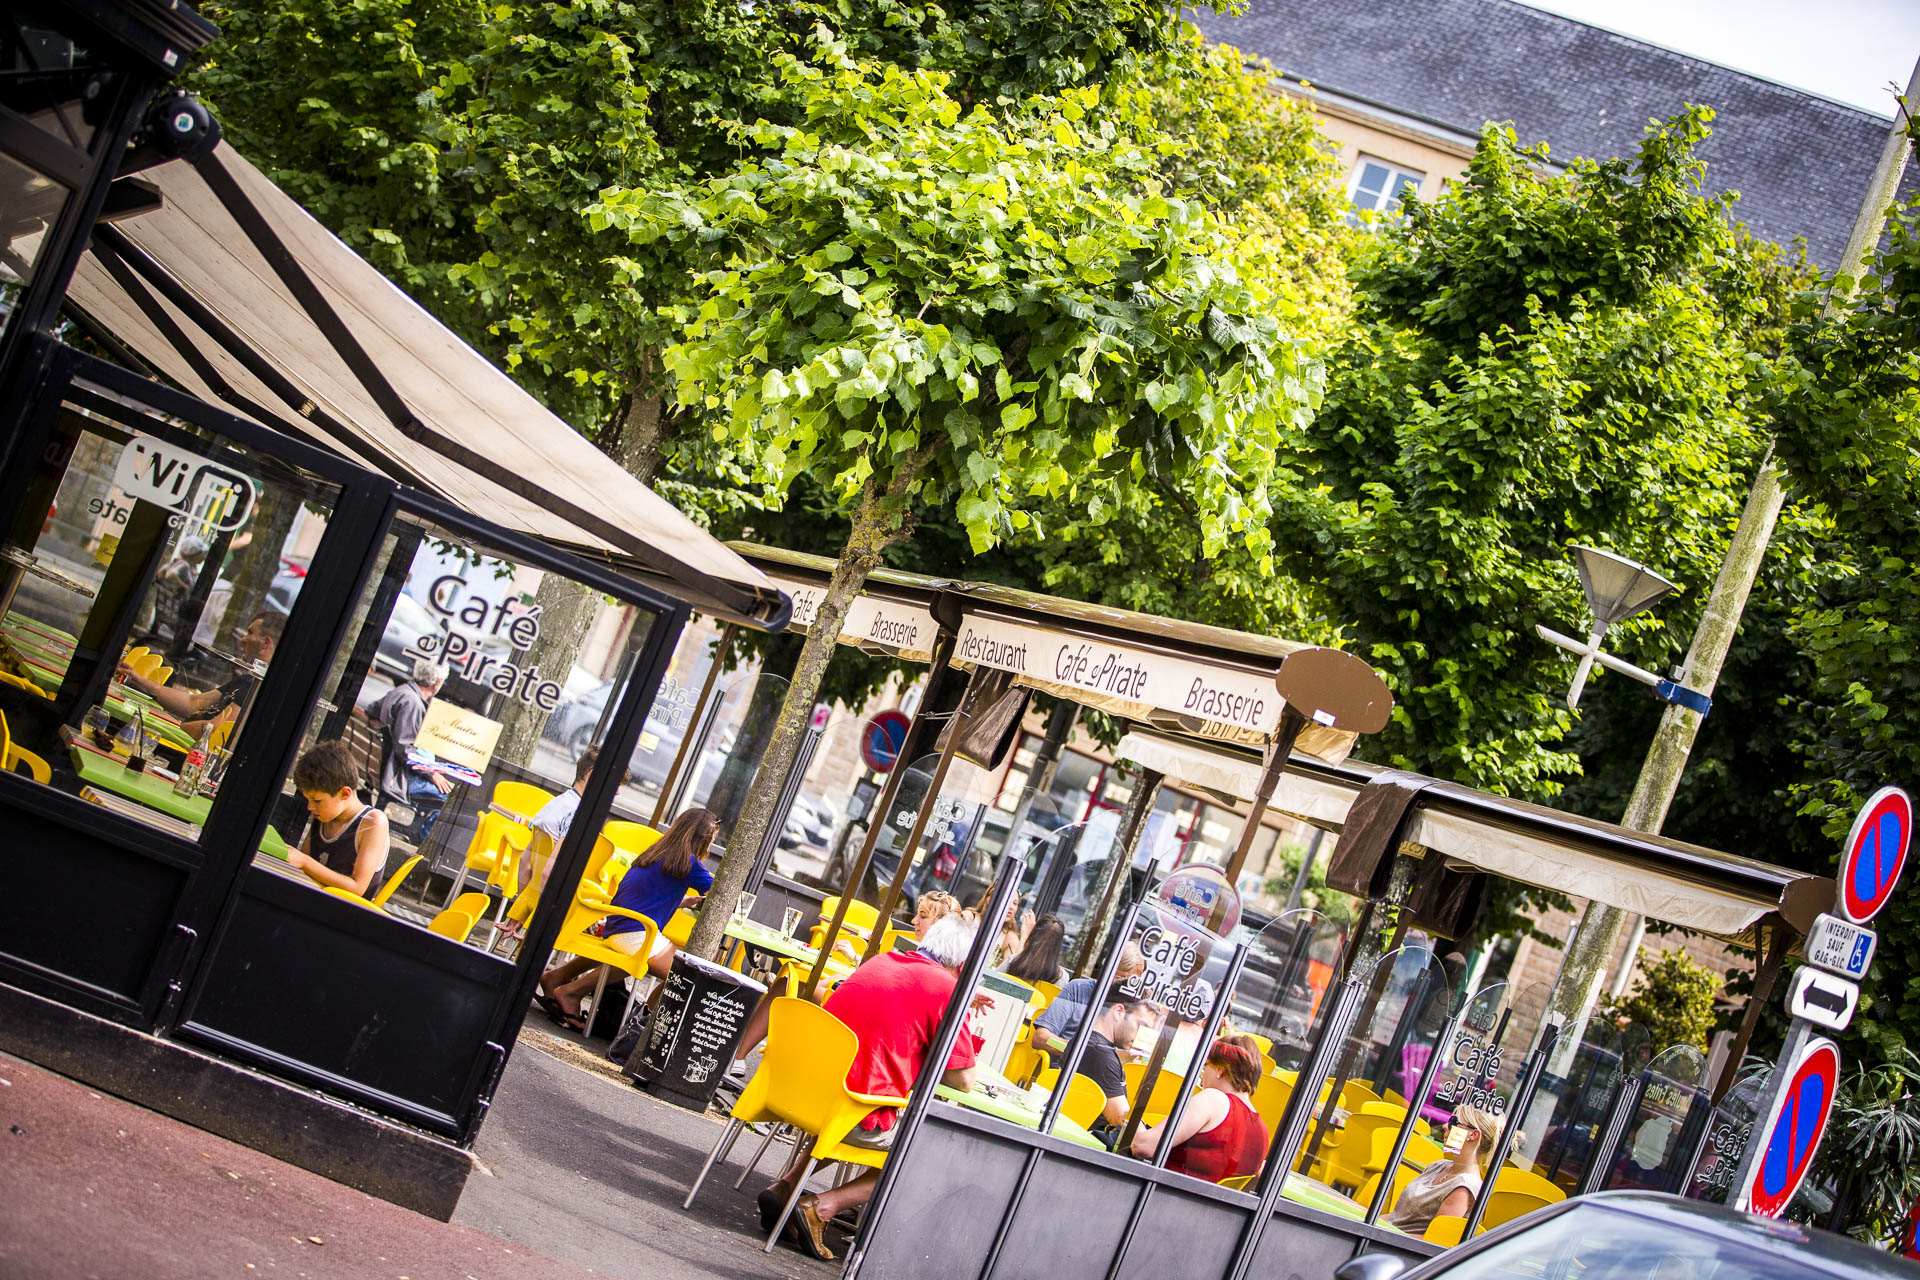 La terrasse du Café le Pirate brasserie à Granville